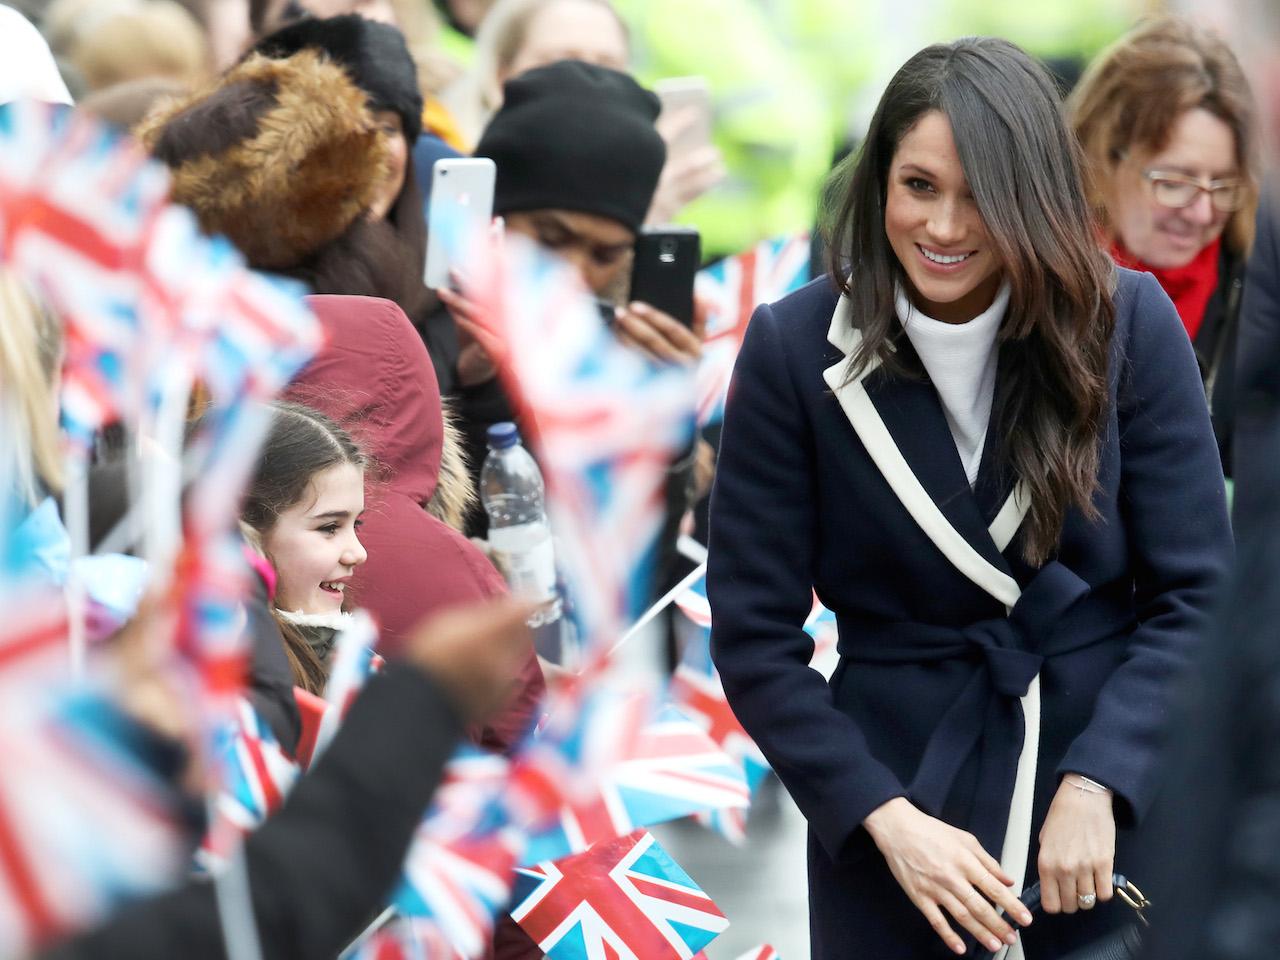 MEghna markle hair-Prince Harry And Meghan Markle Visit Birmingham